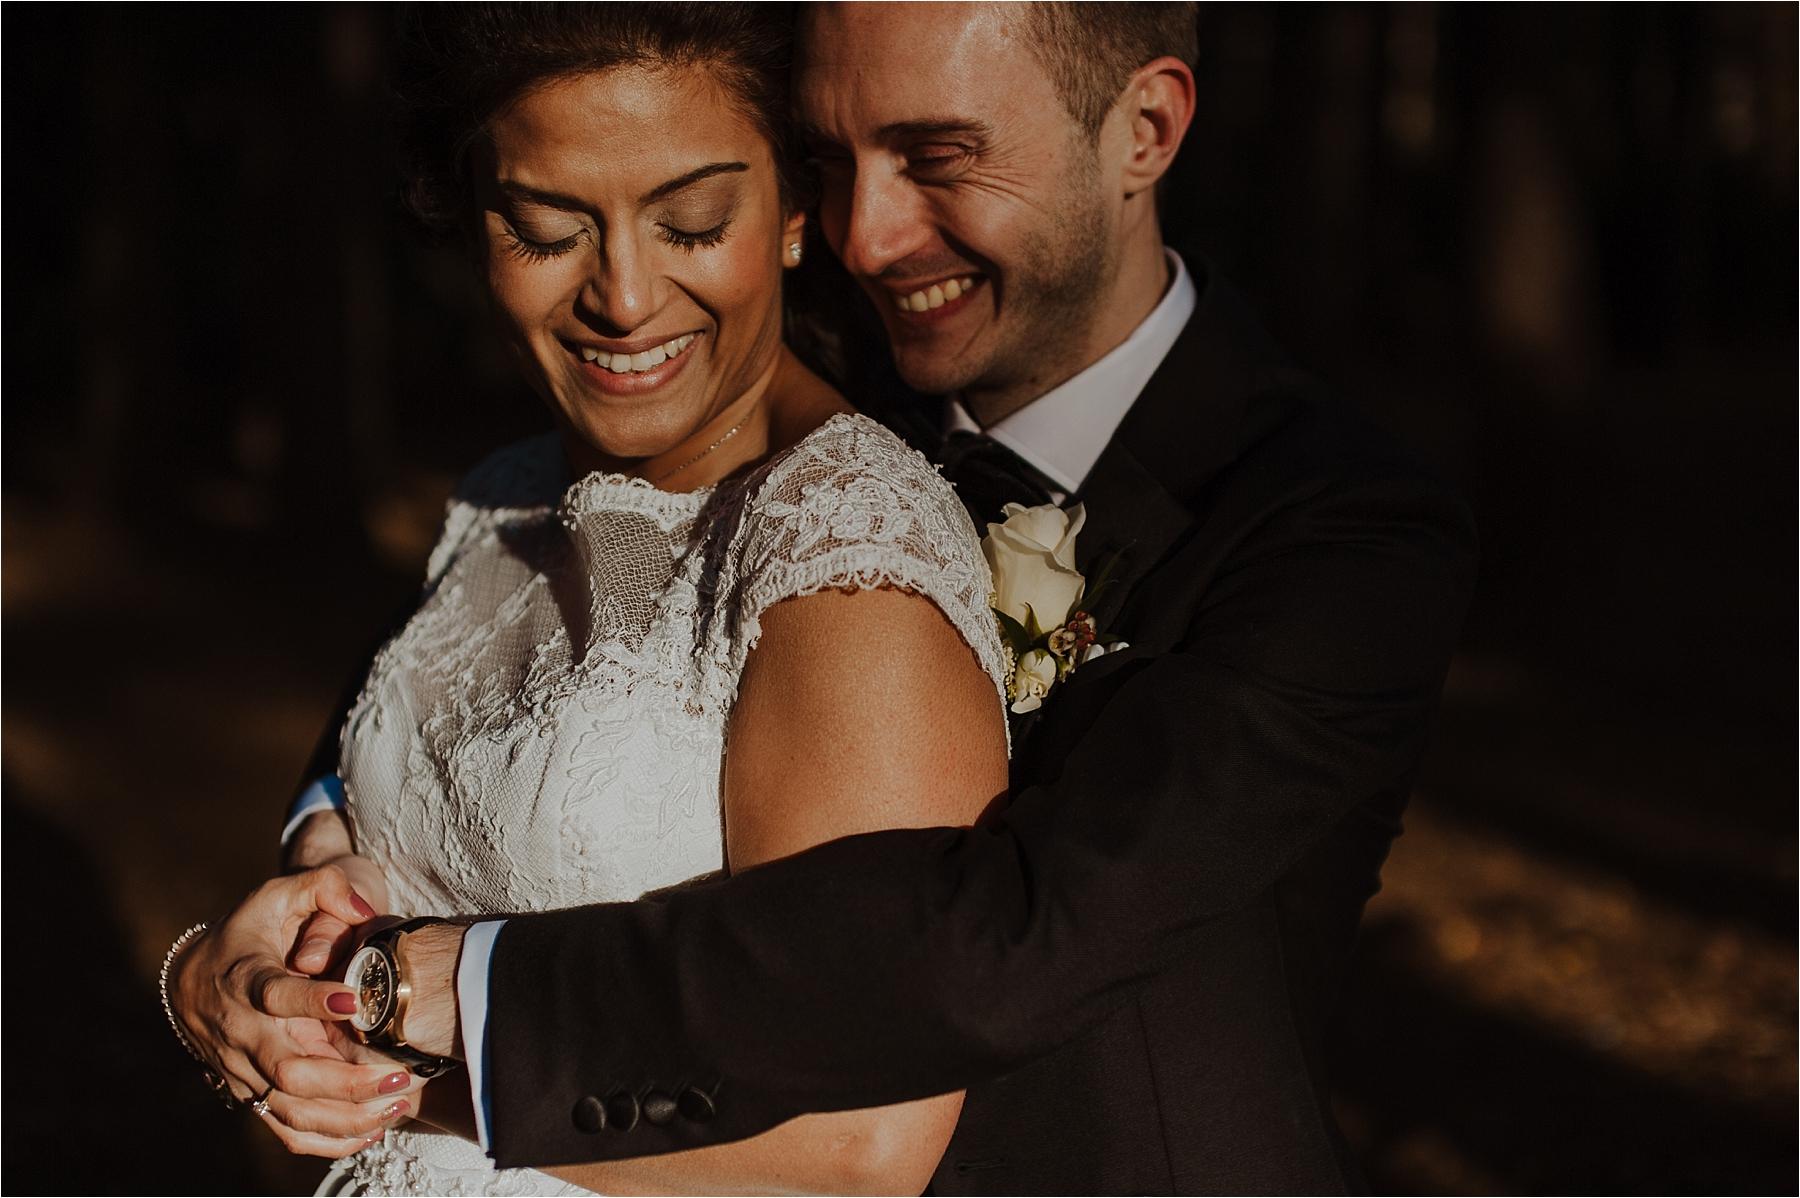 wedding photography pricing london